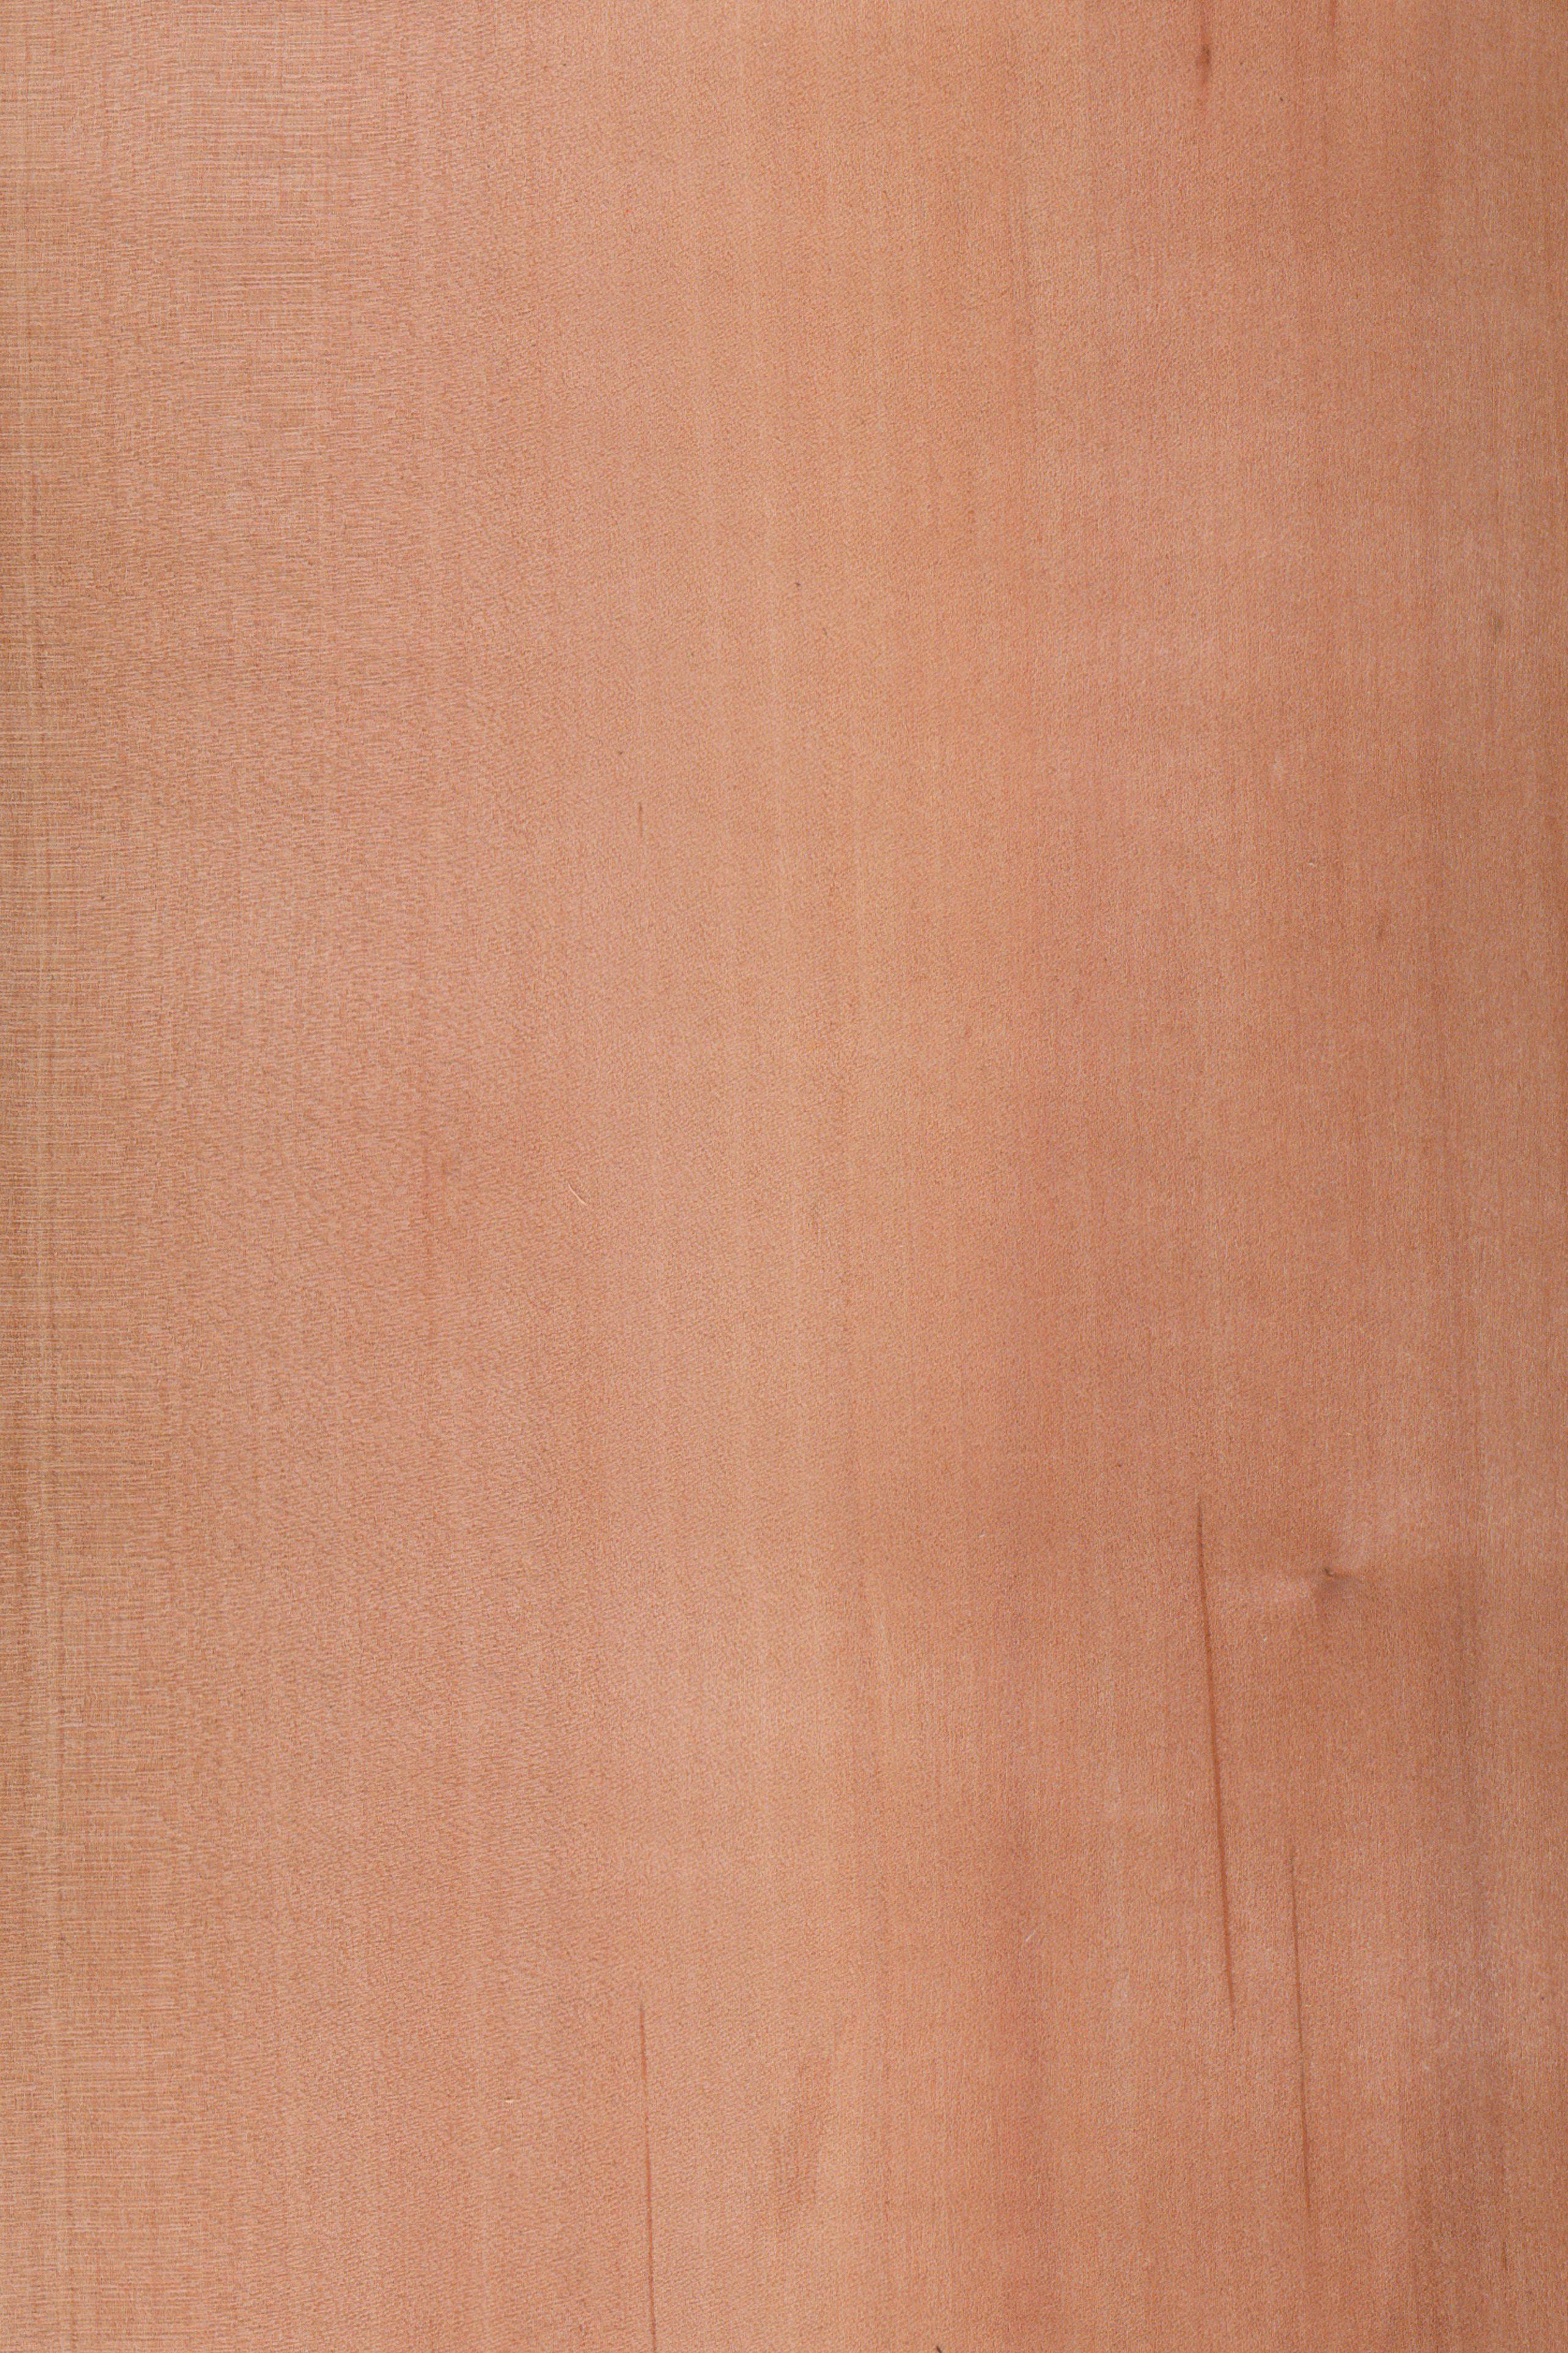 Holz Arten eslbeere furnier holzart elsbeere blatt dunkel braun